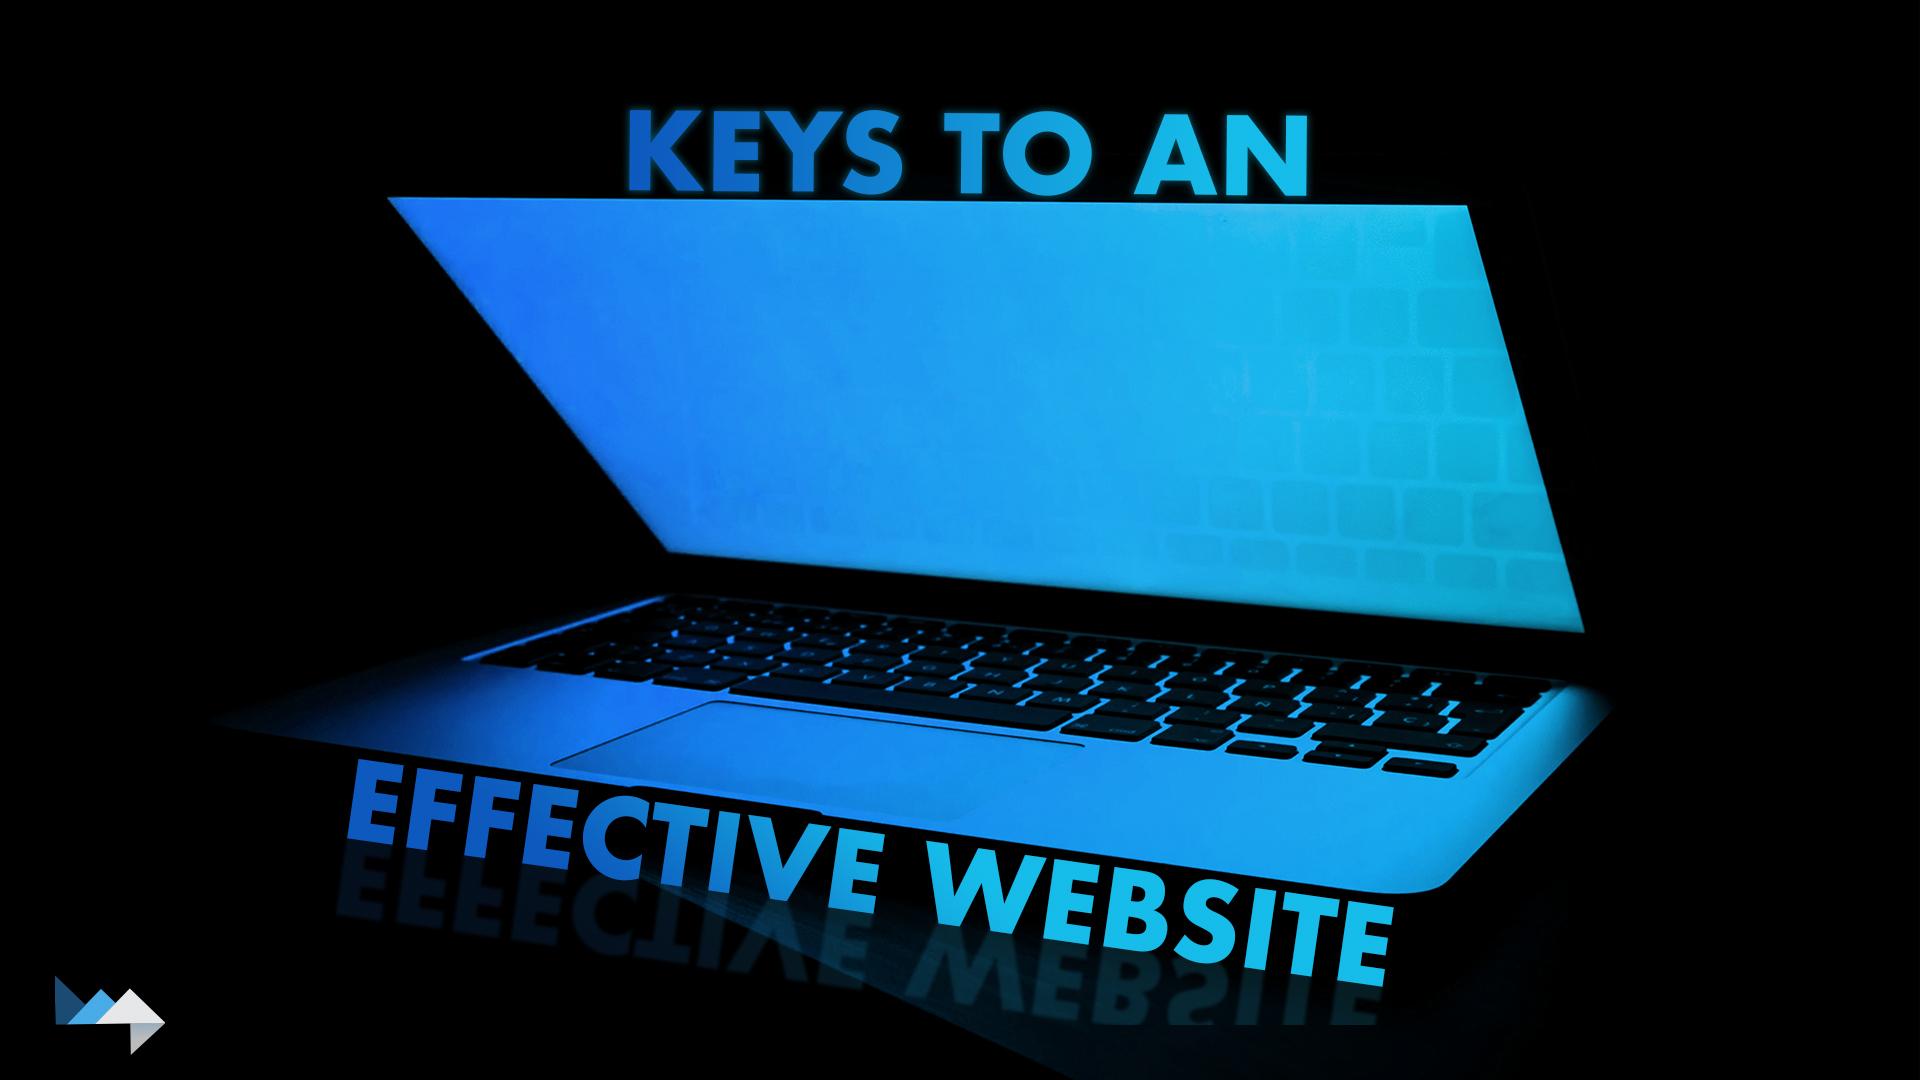 Keys to an Effective Website